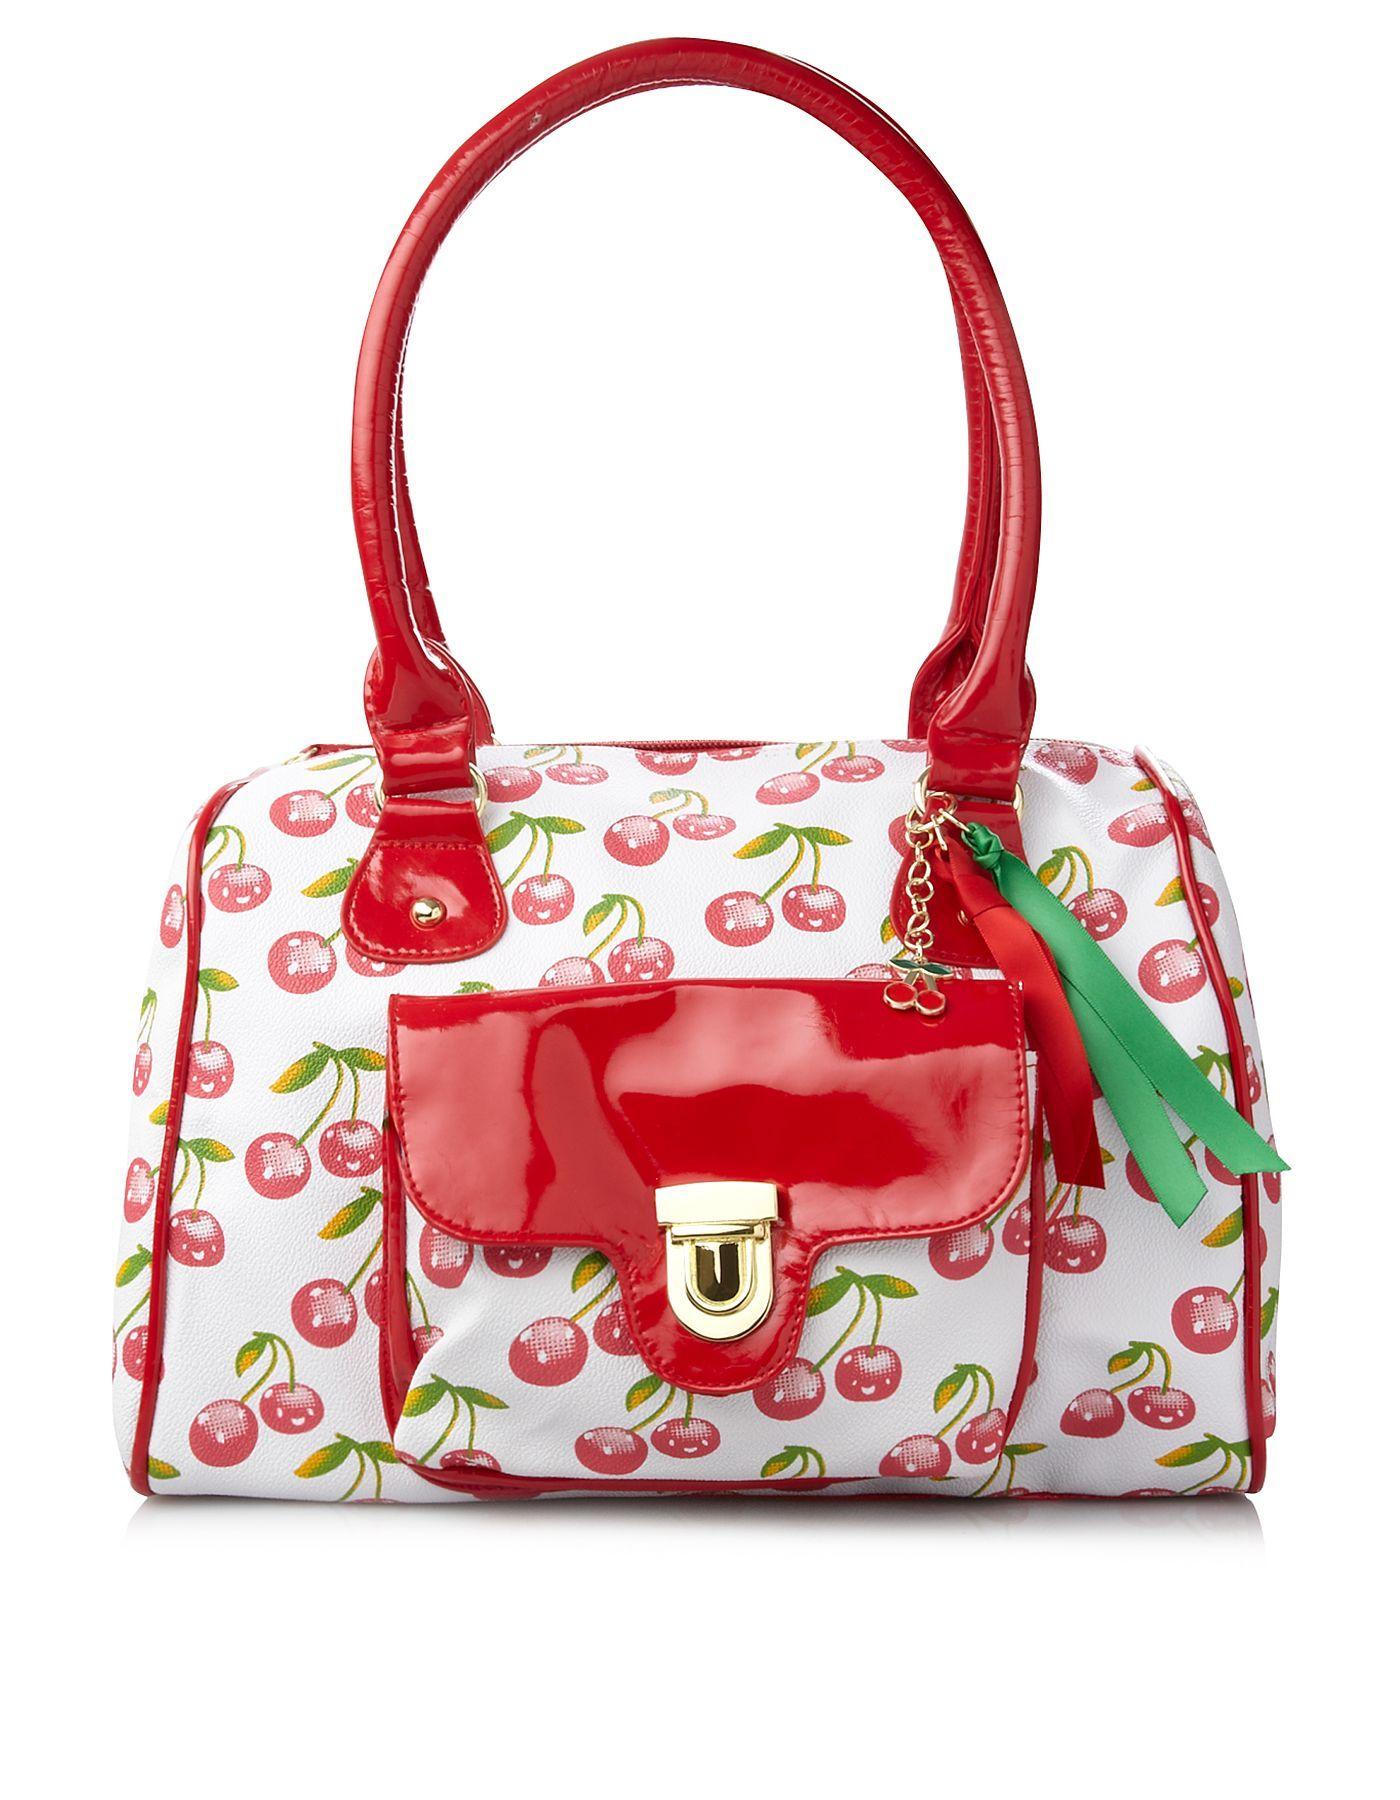 Cherry Print Handbag | Cherry print, Printed handbags, Bags